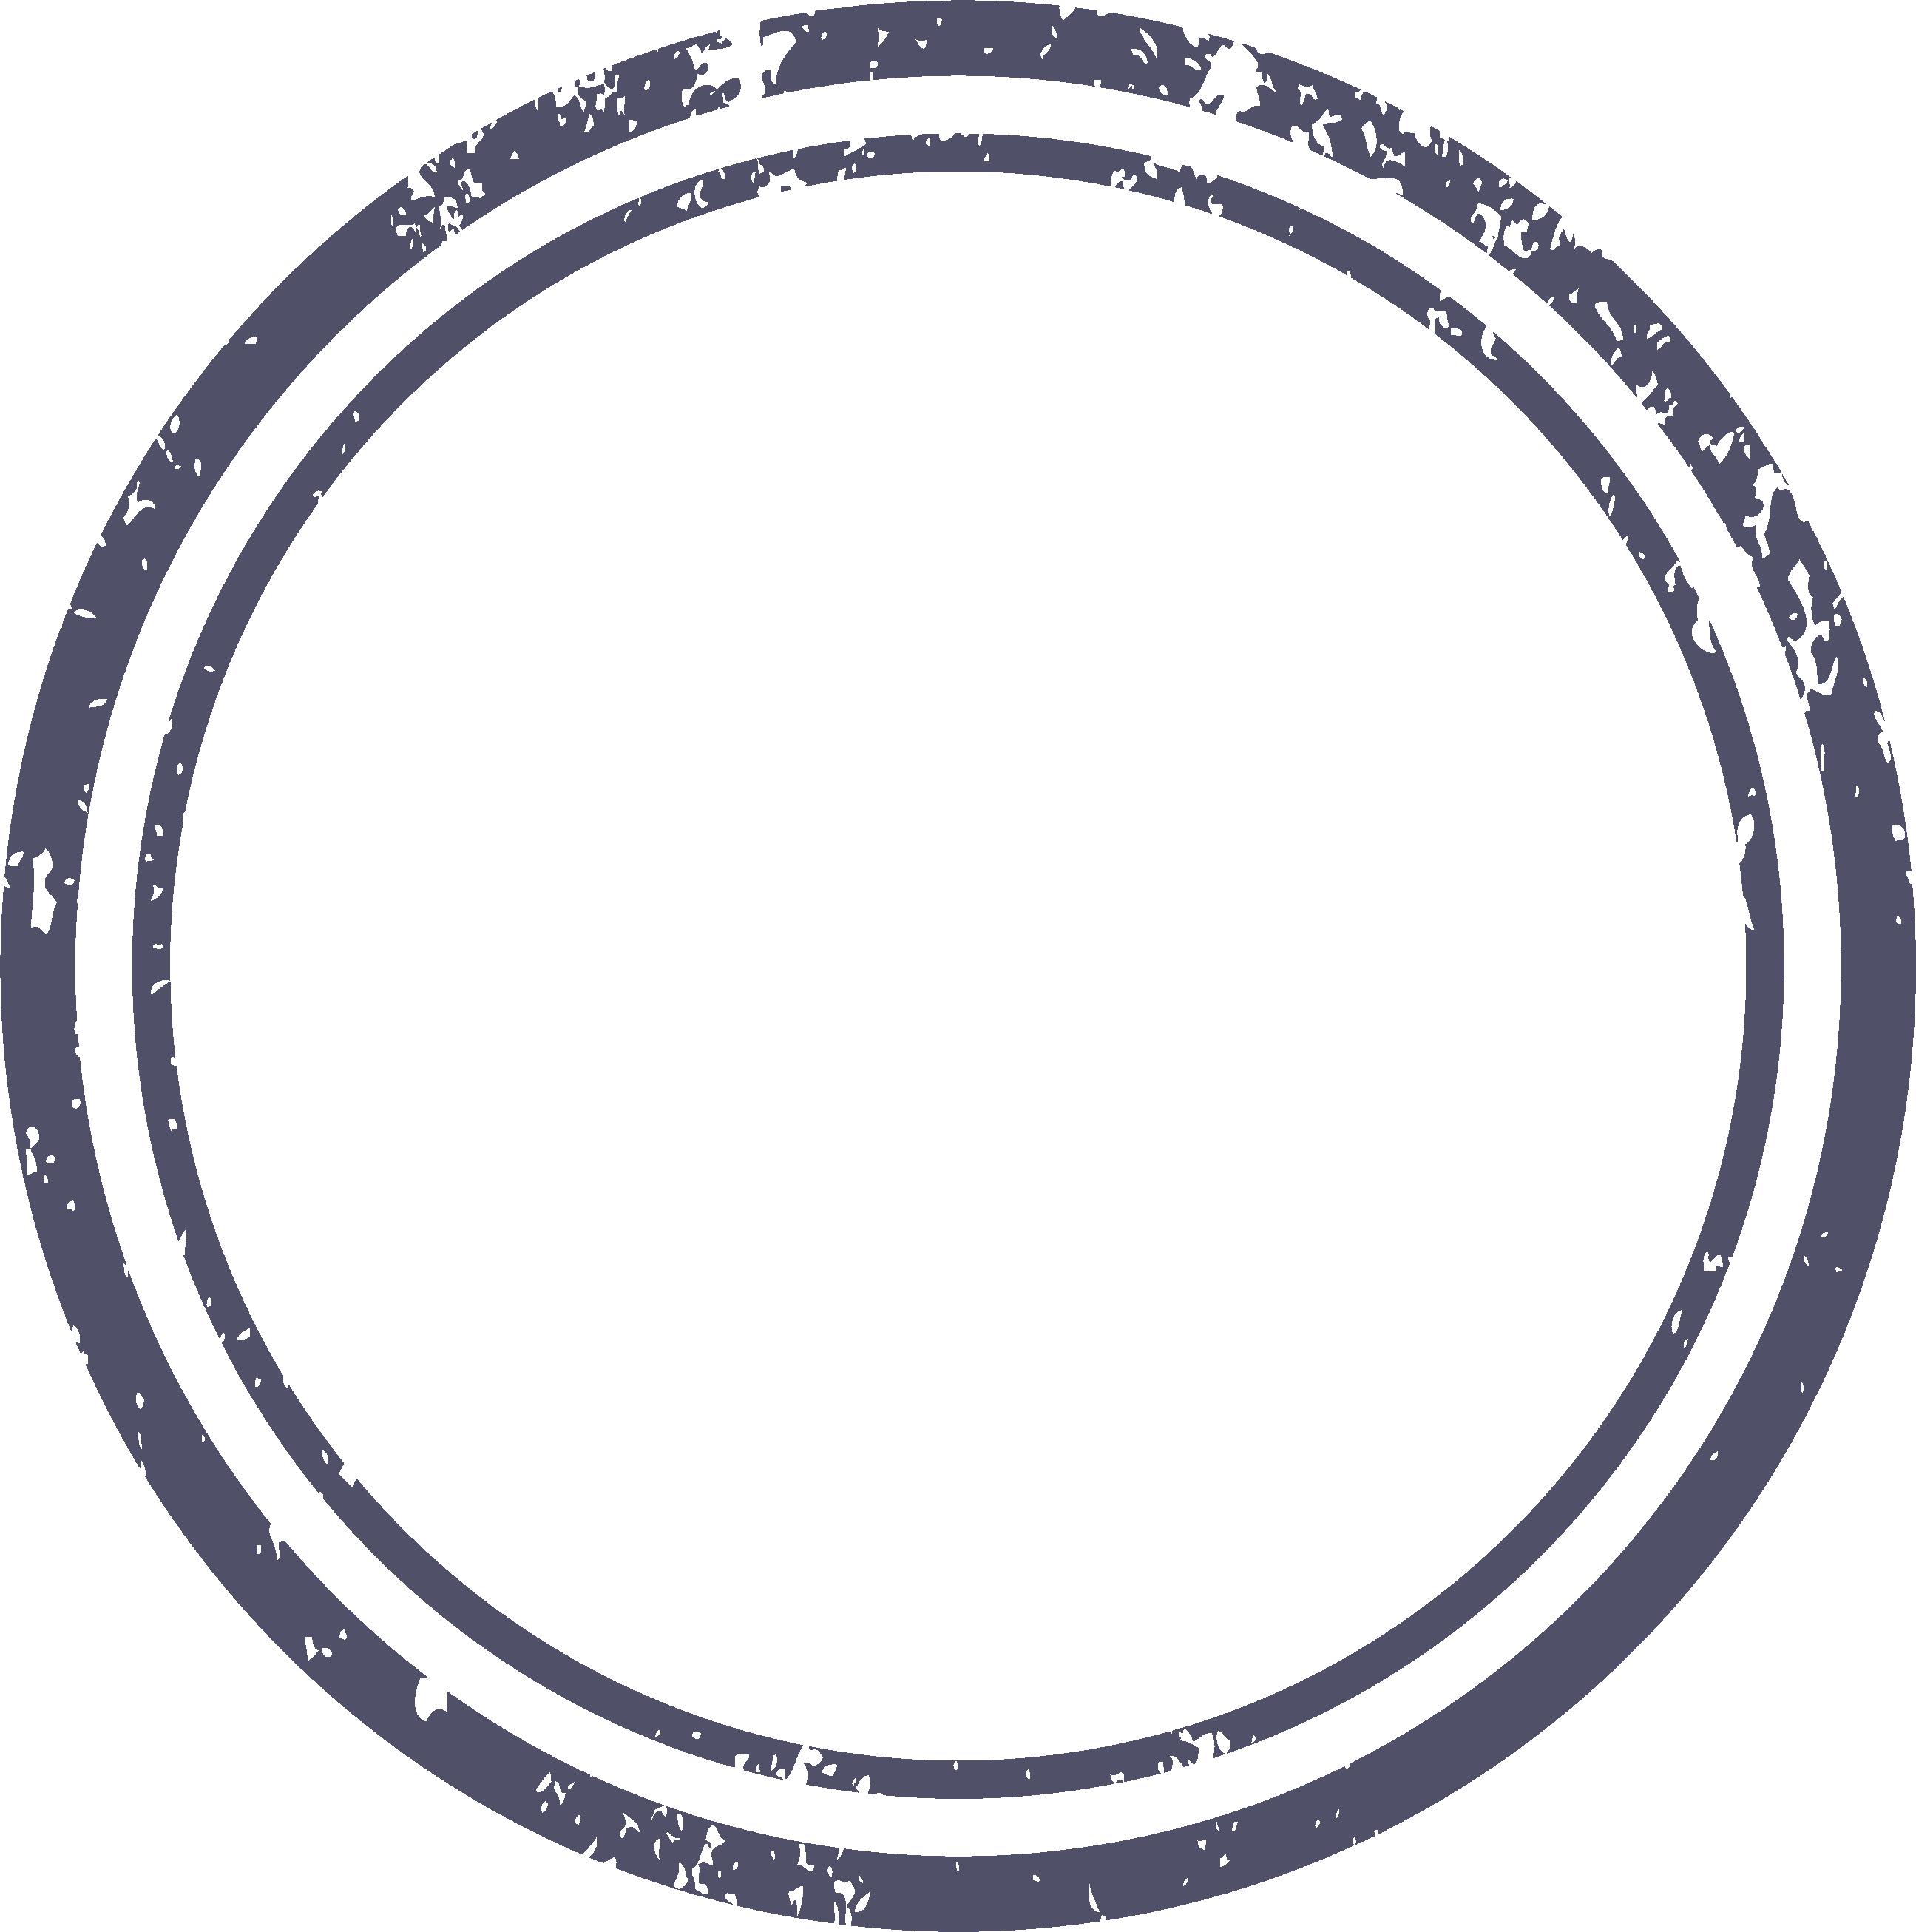 Circle border png. Clock icon dark blue